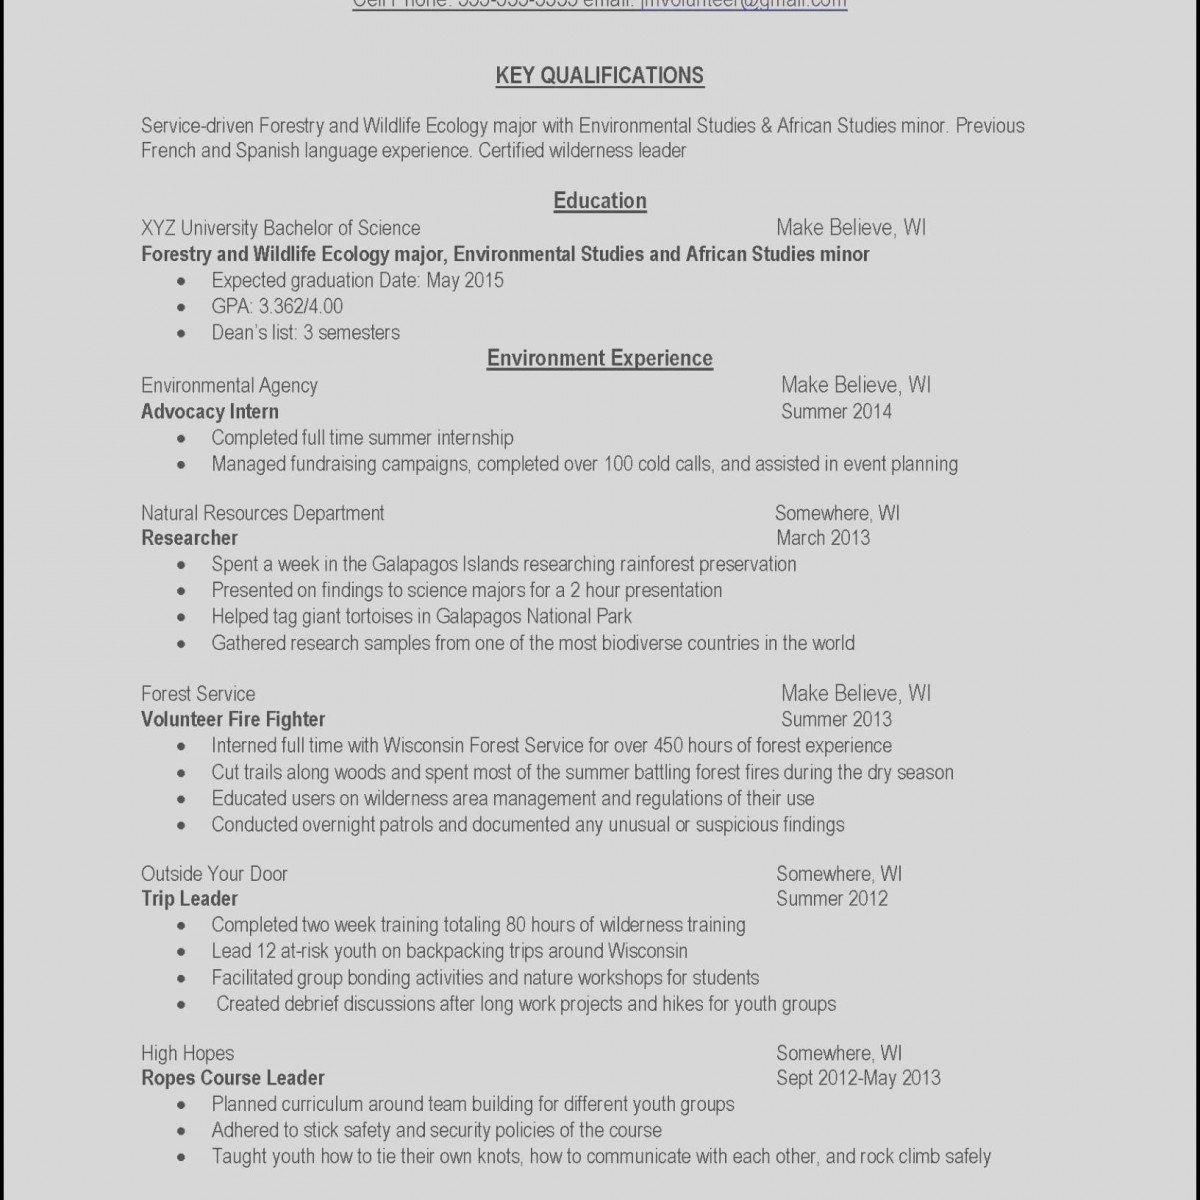 Graduation Date On Resume Fresh Resume Expected Graduation Date